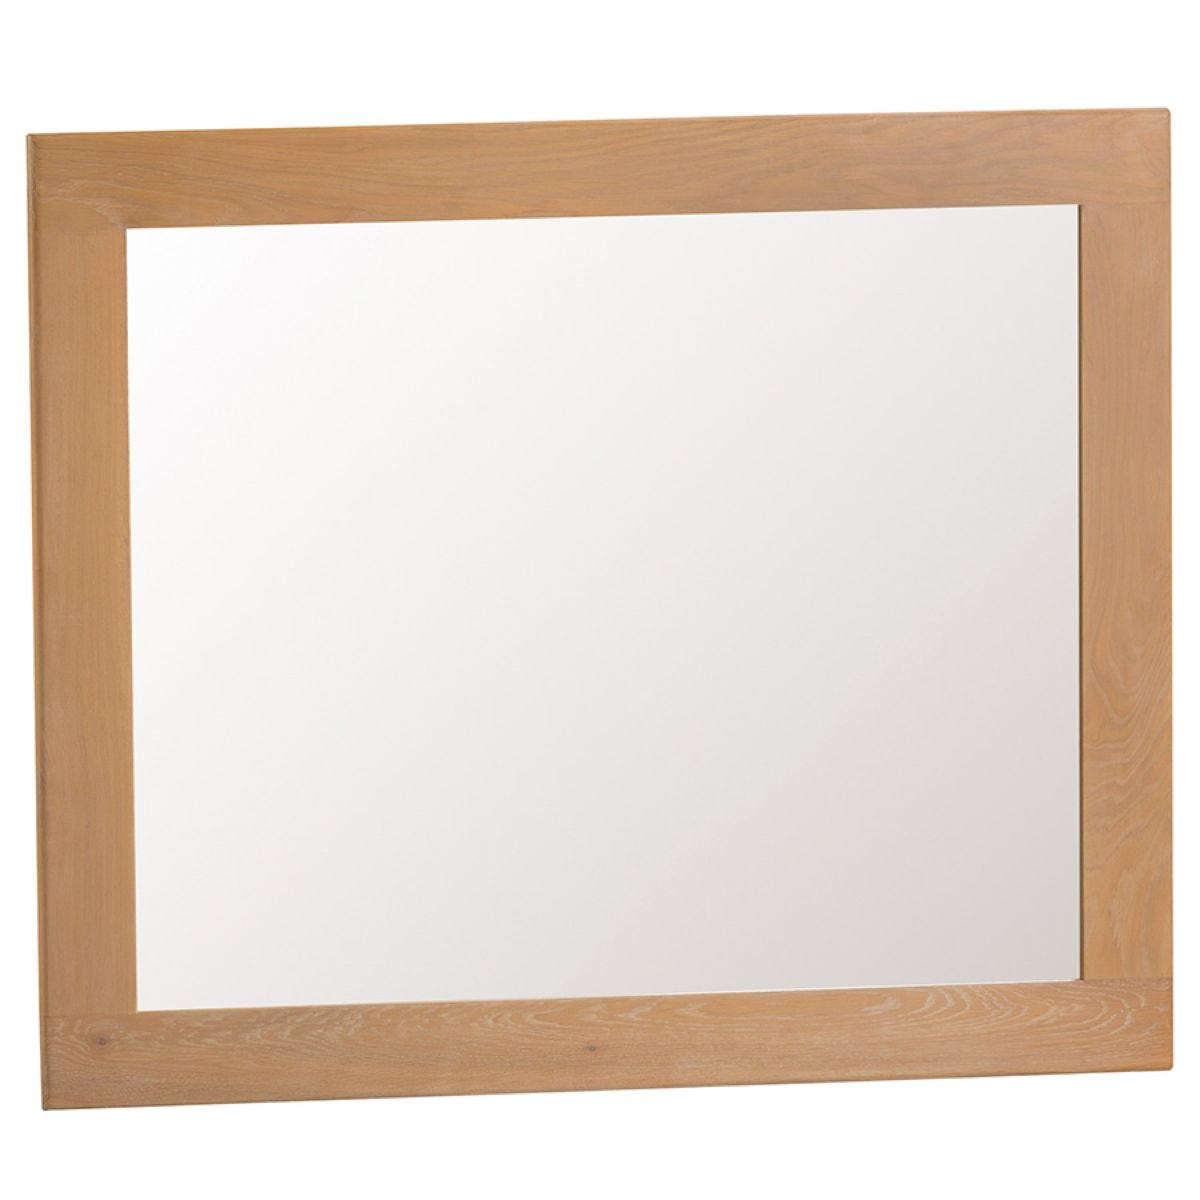 Graceford Ready Assembled Large Oak Wall Mirror